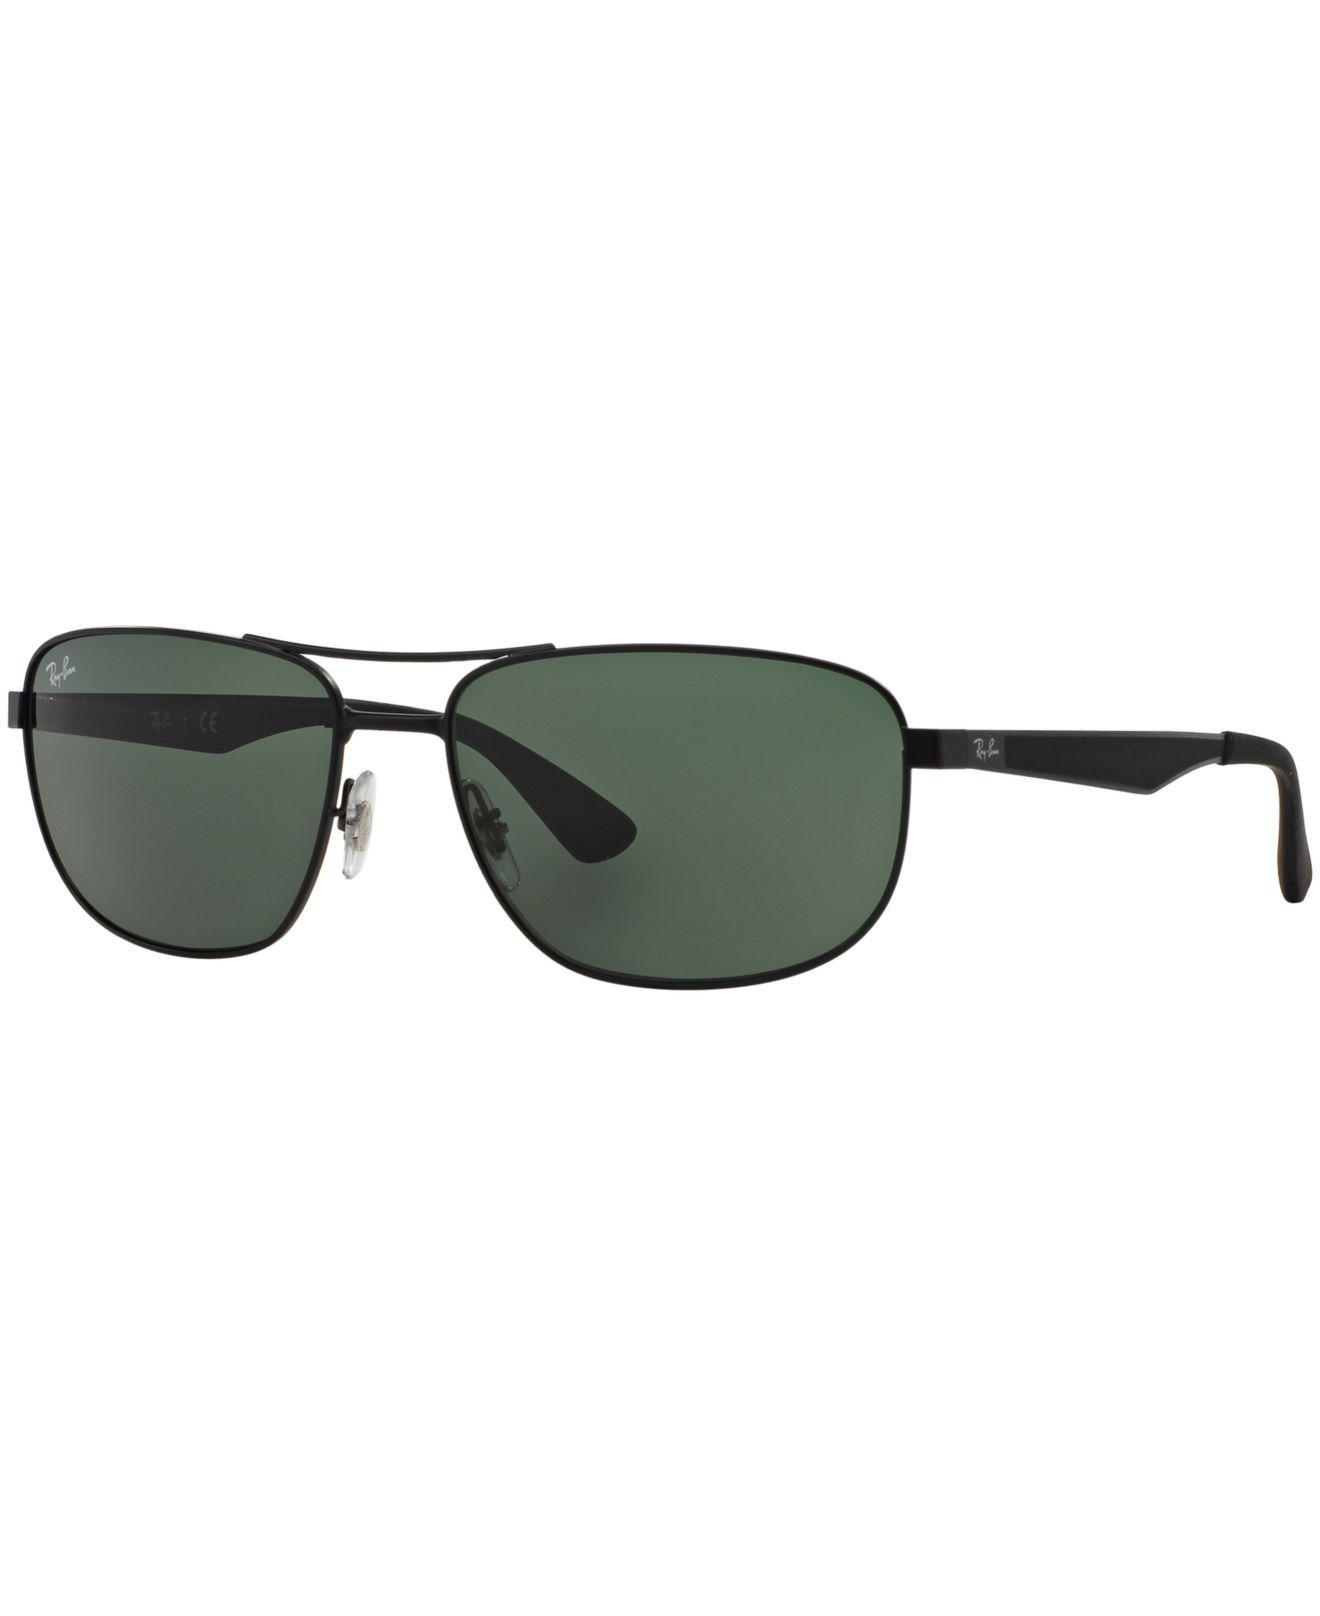 e045ad15bd Ray-Ban. Men s Black Sunglasses ...